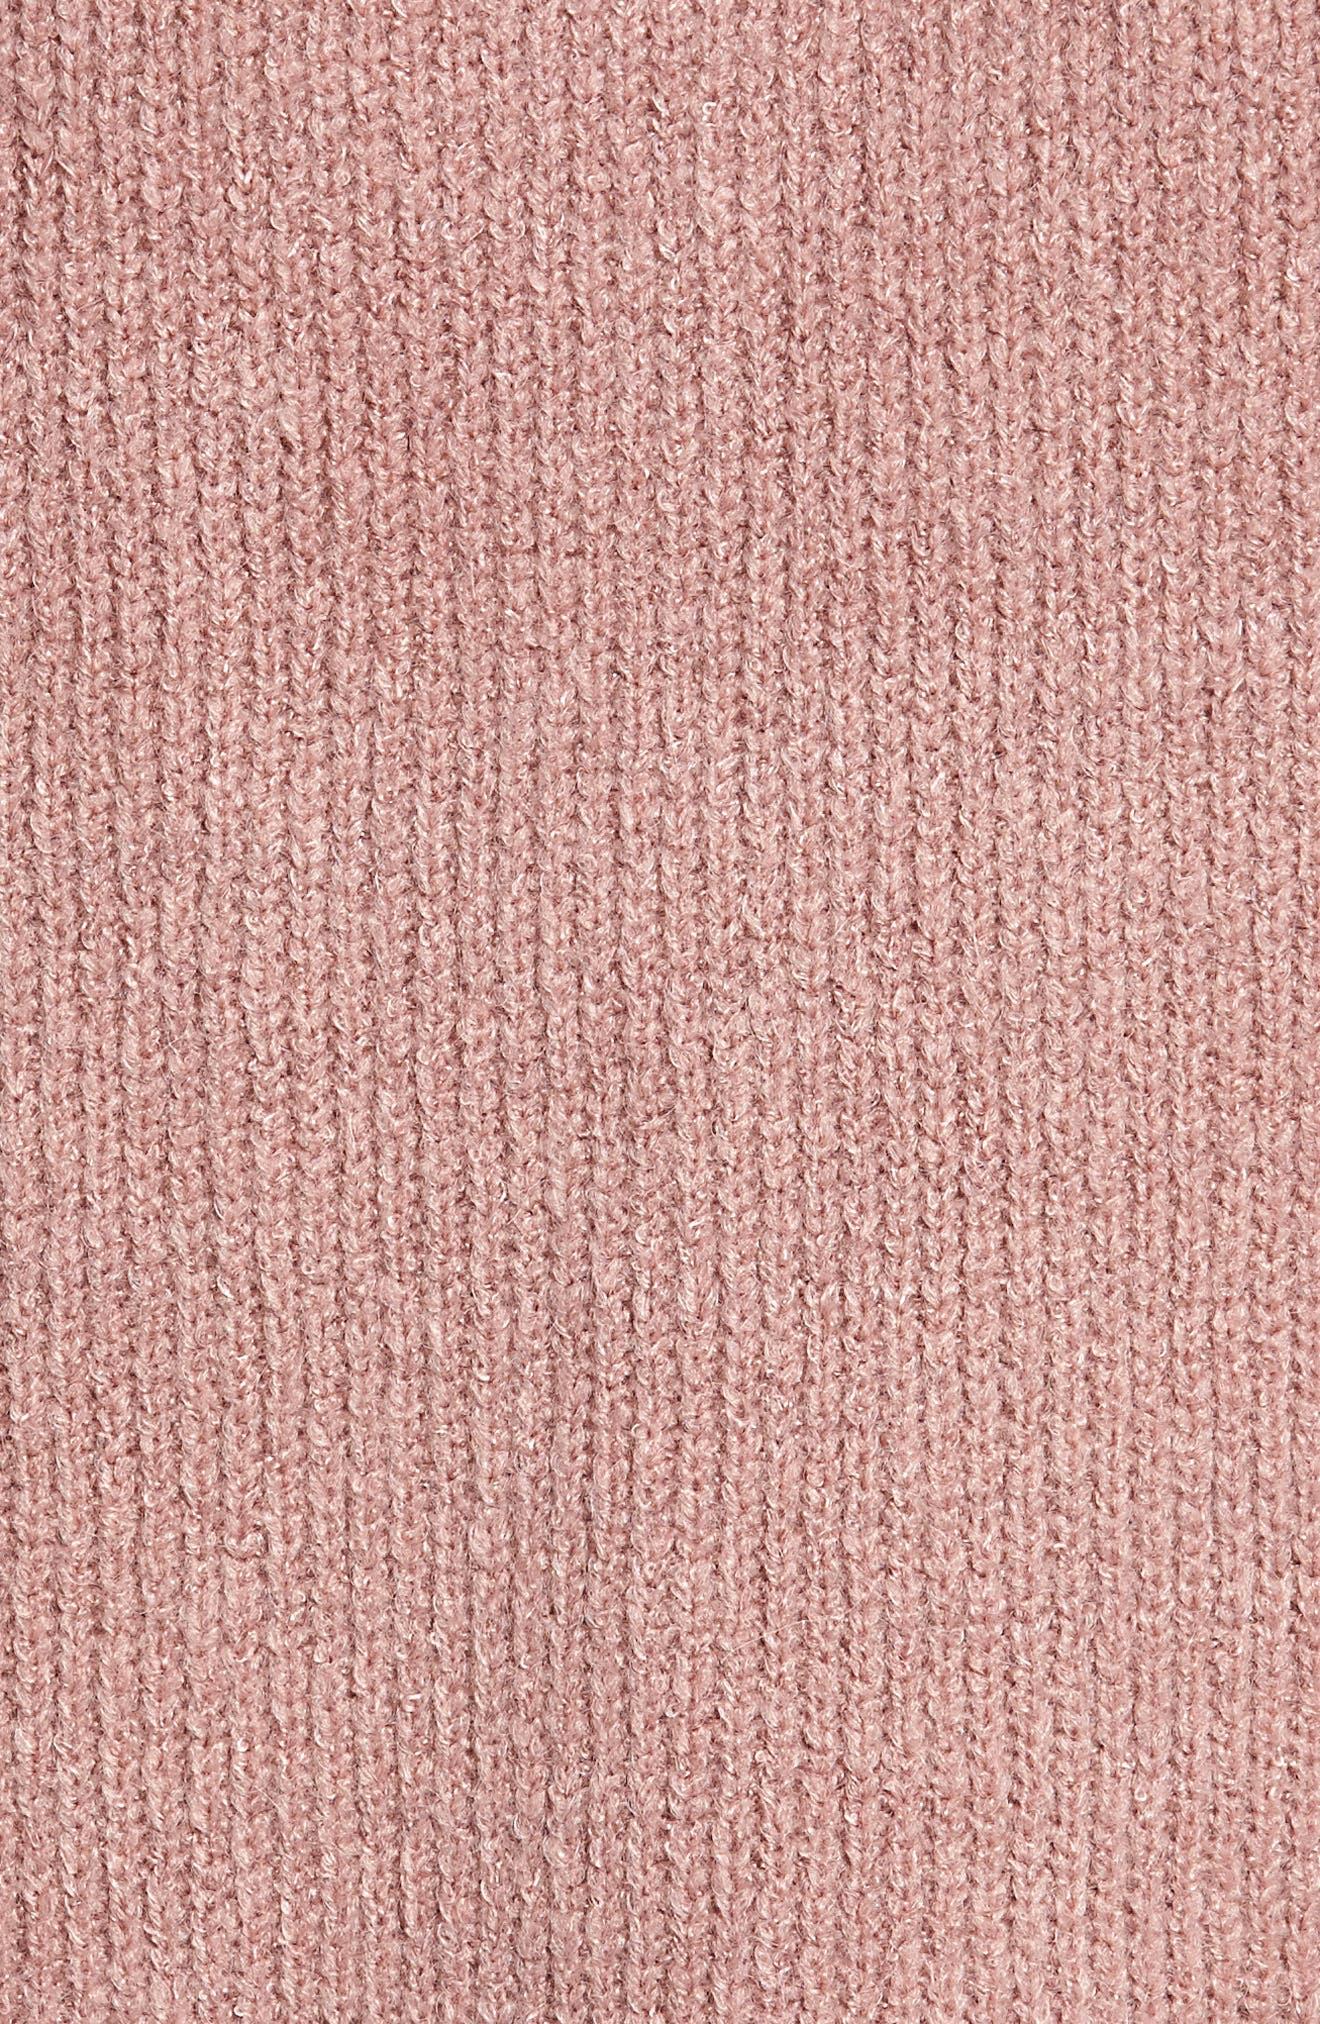 Cowl Neck Sweater,                             Alternate thumbnail 5, color,                             500